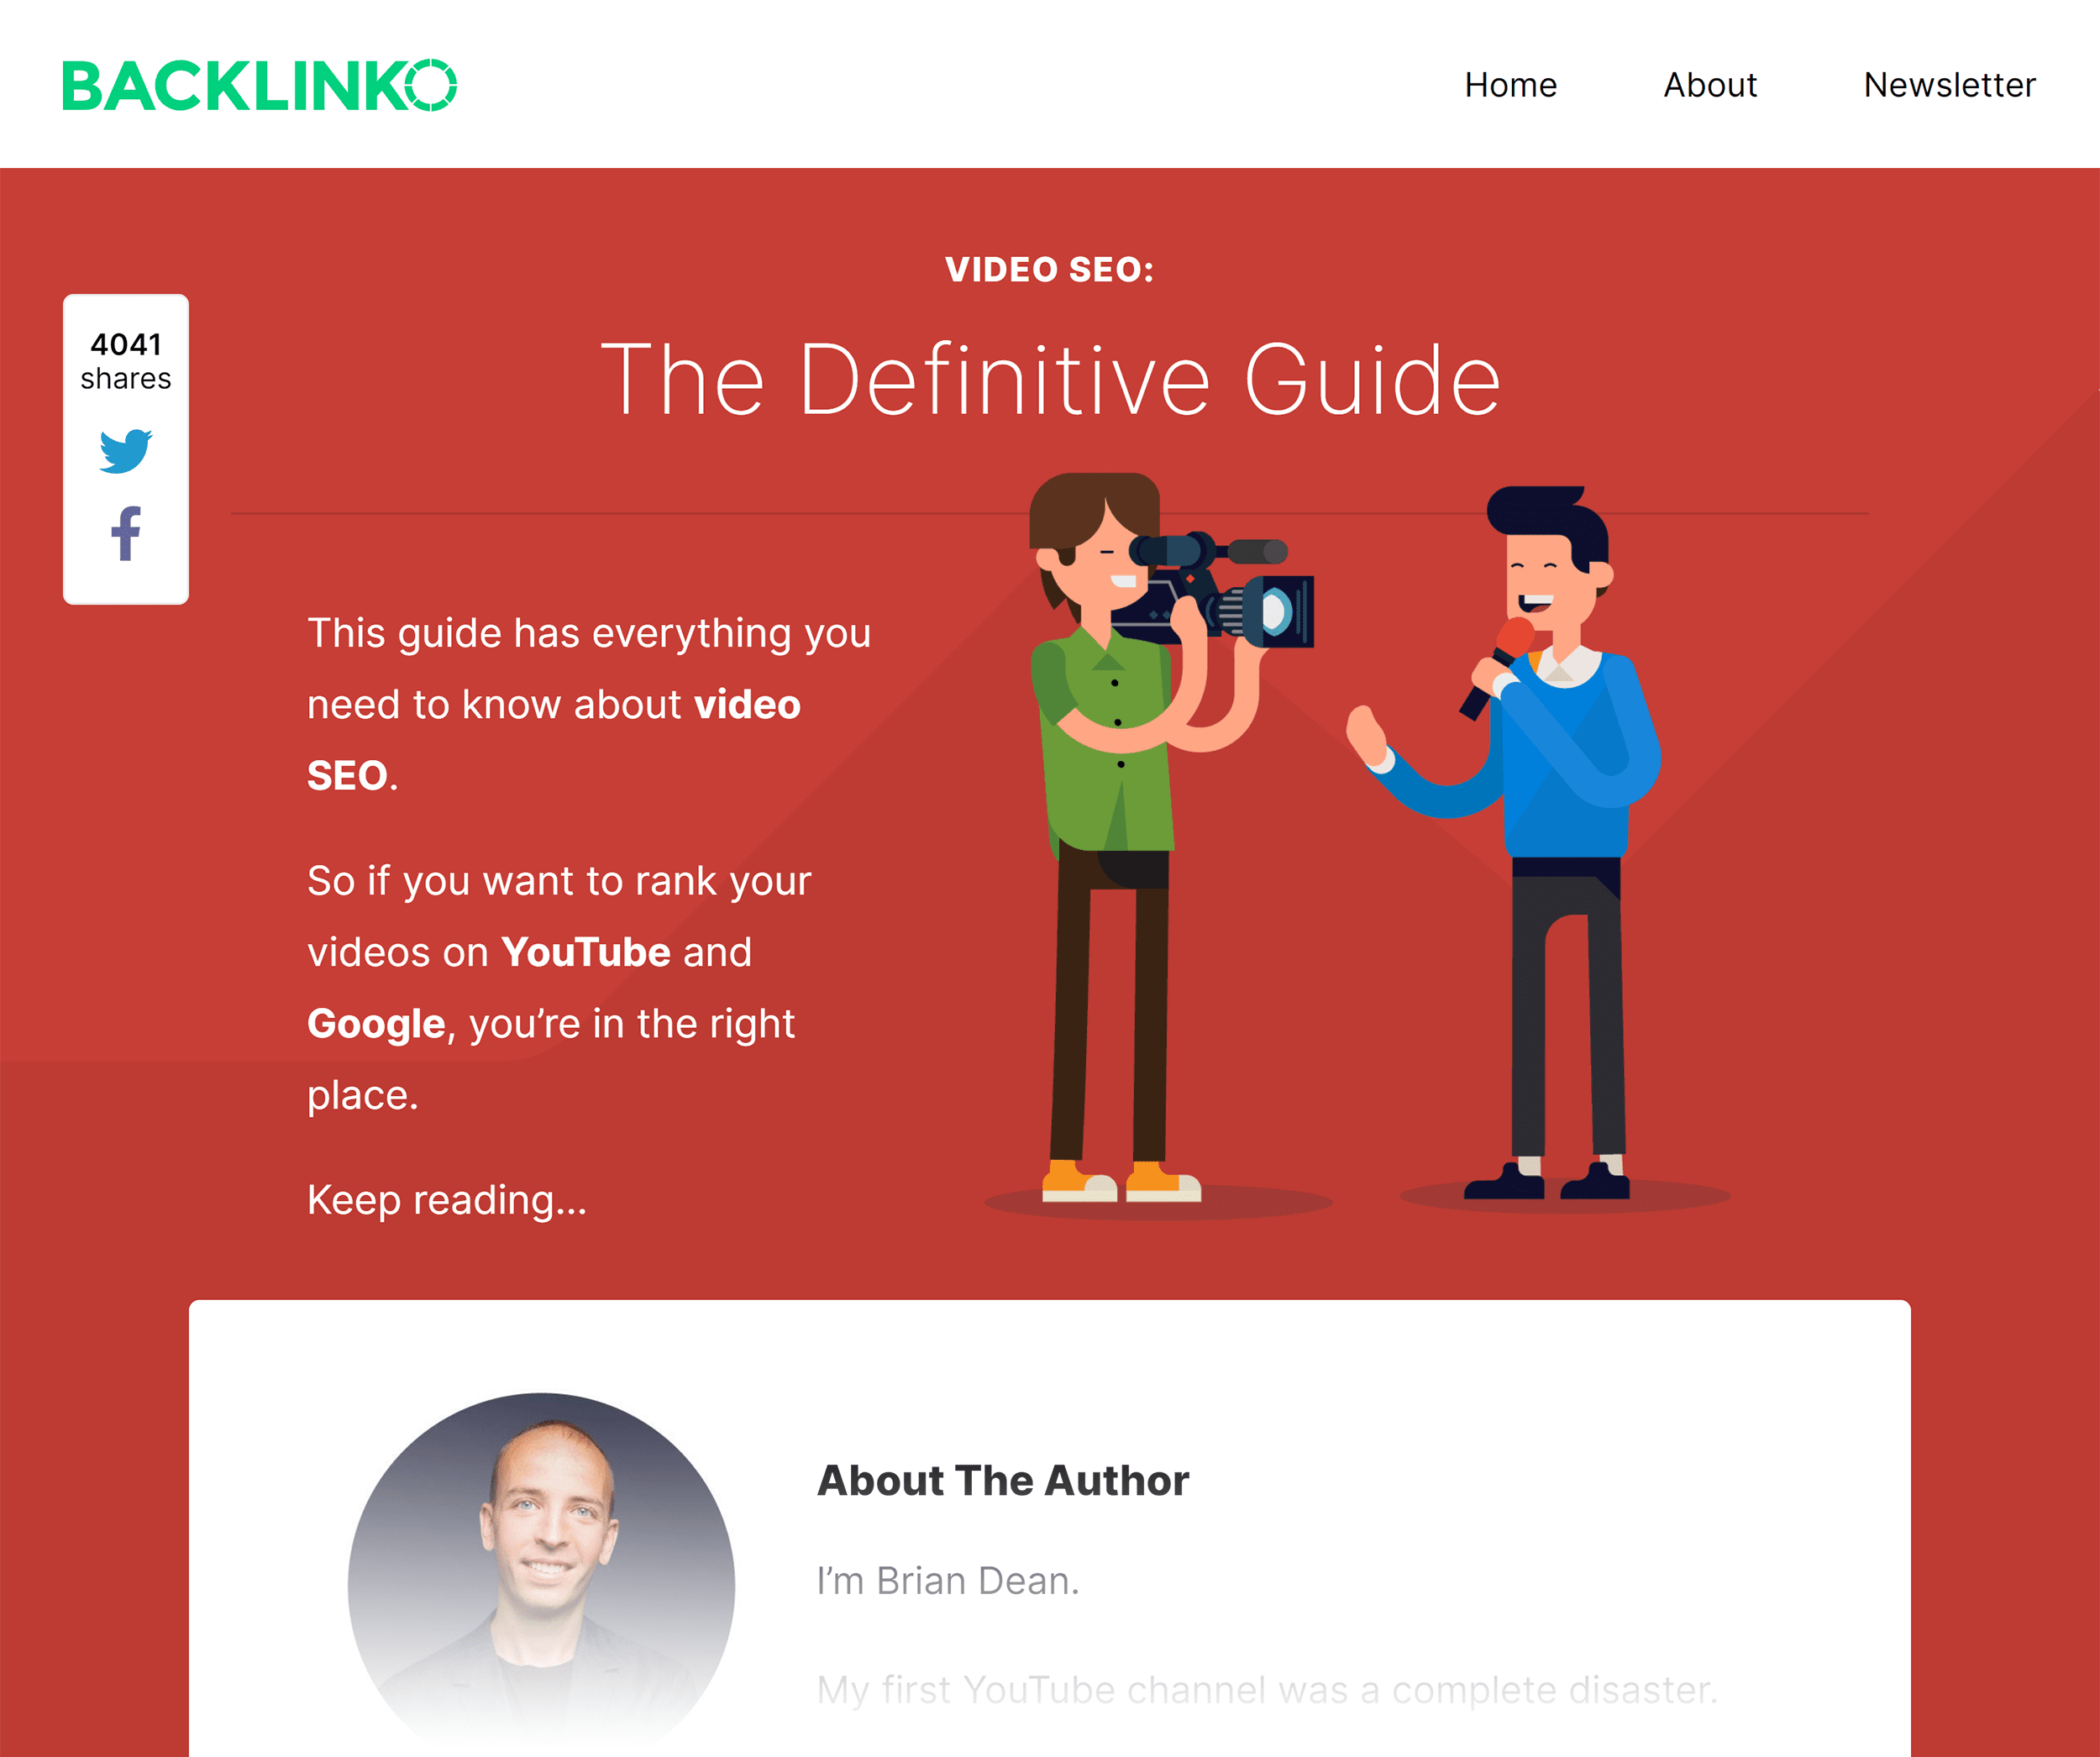 Backlinko – Video SEO guide